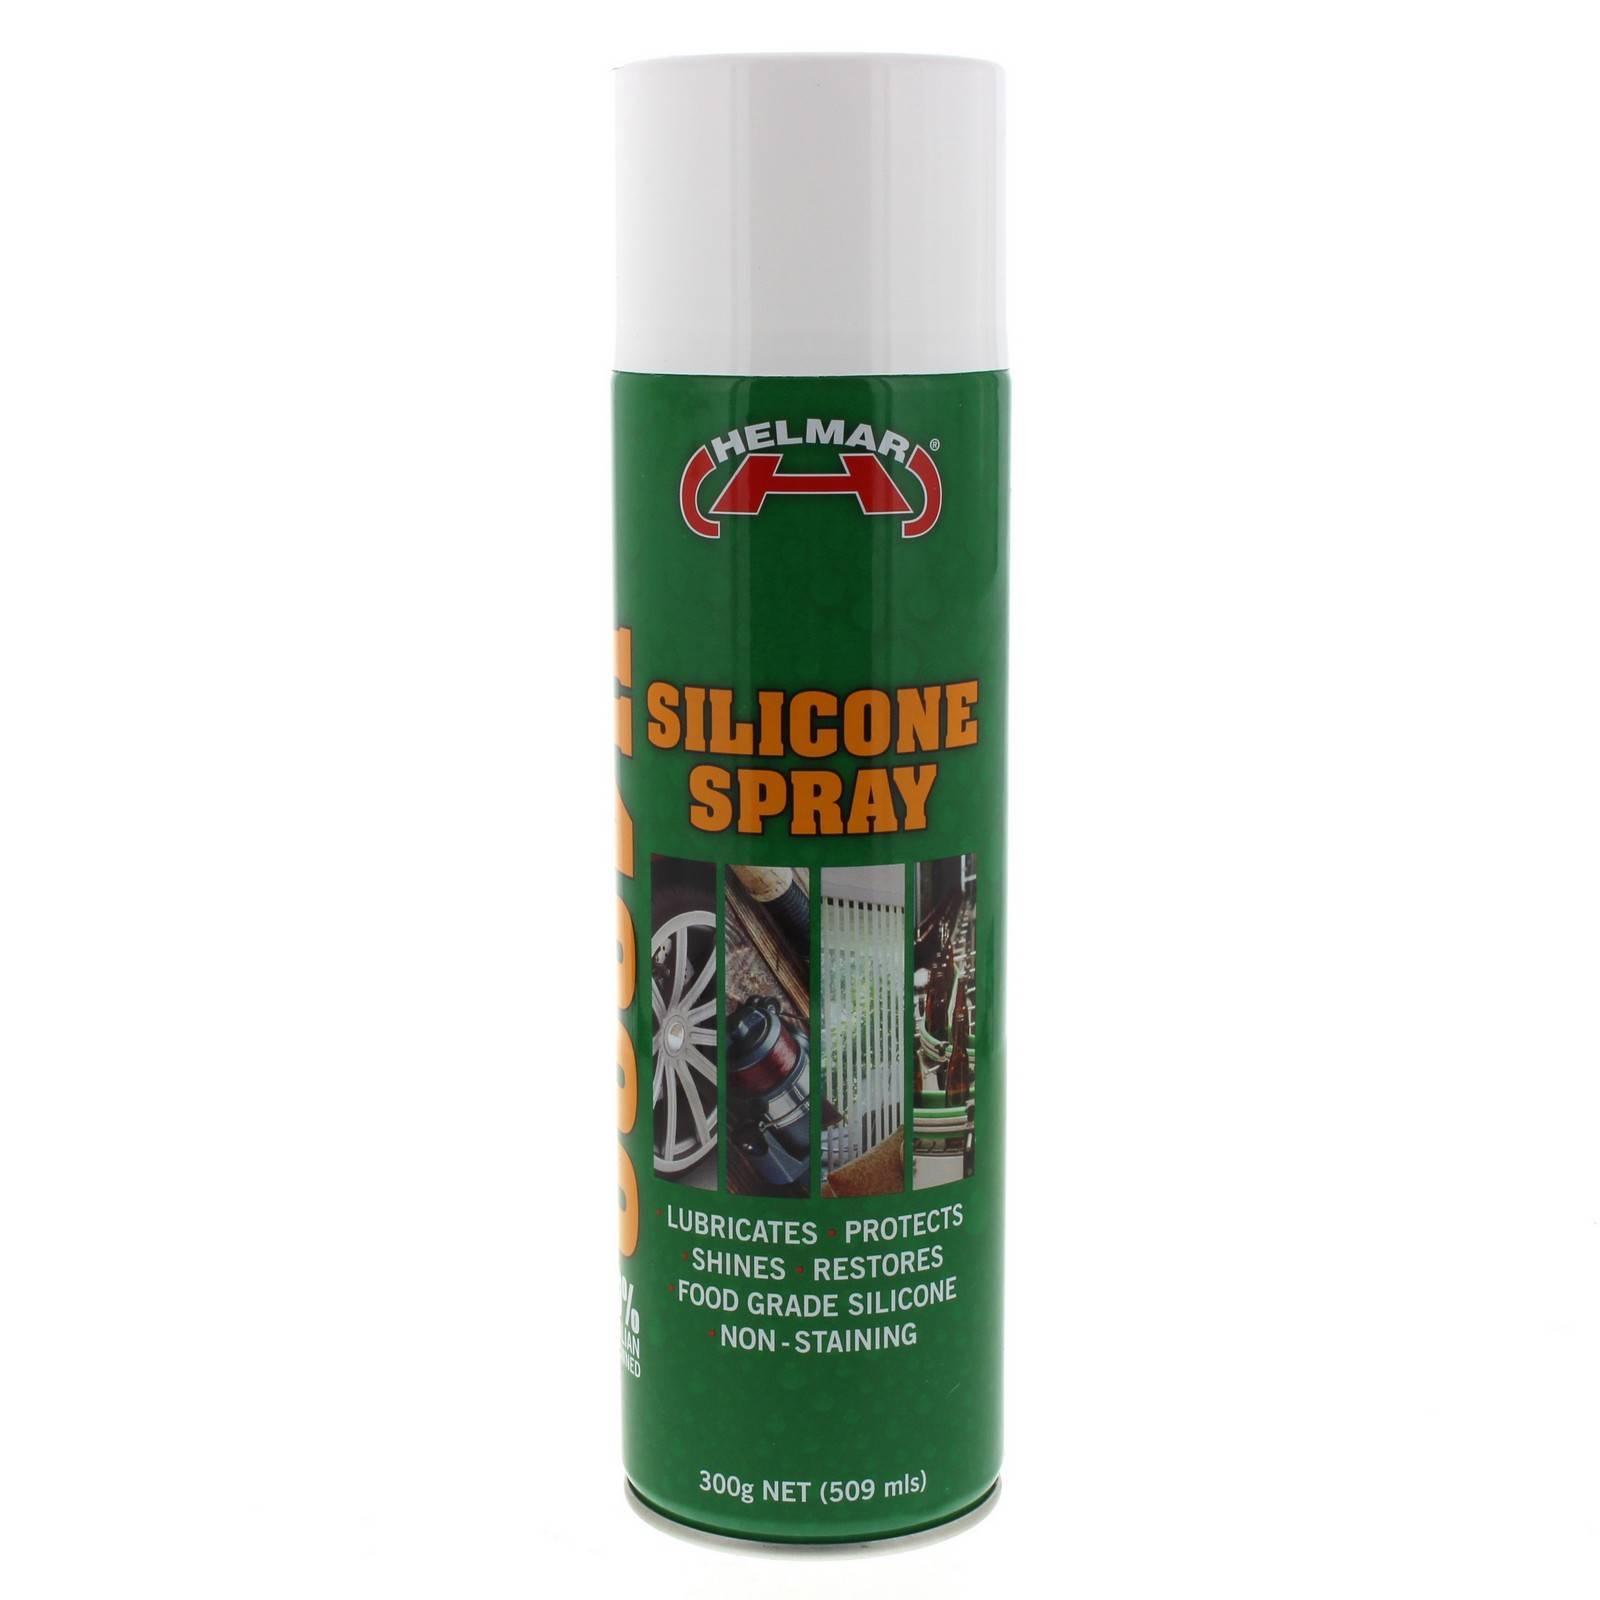 Silicone Spray Lubricant Protect Shine Restore 300g Aerosol Spray Can